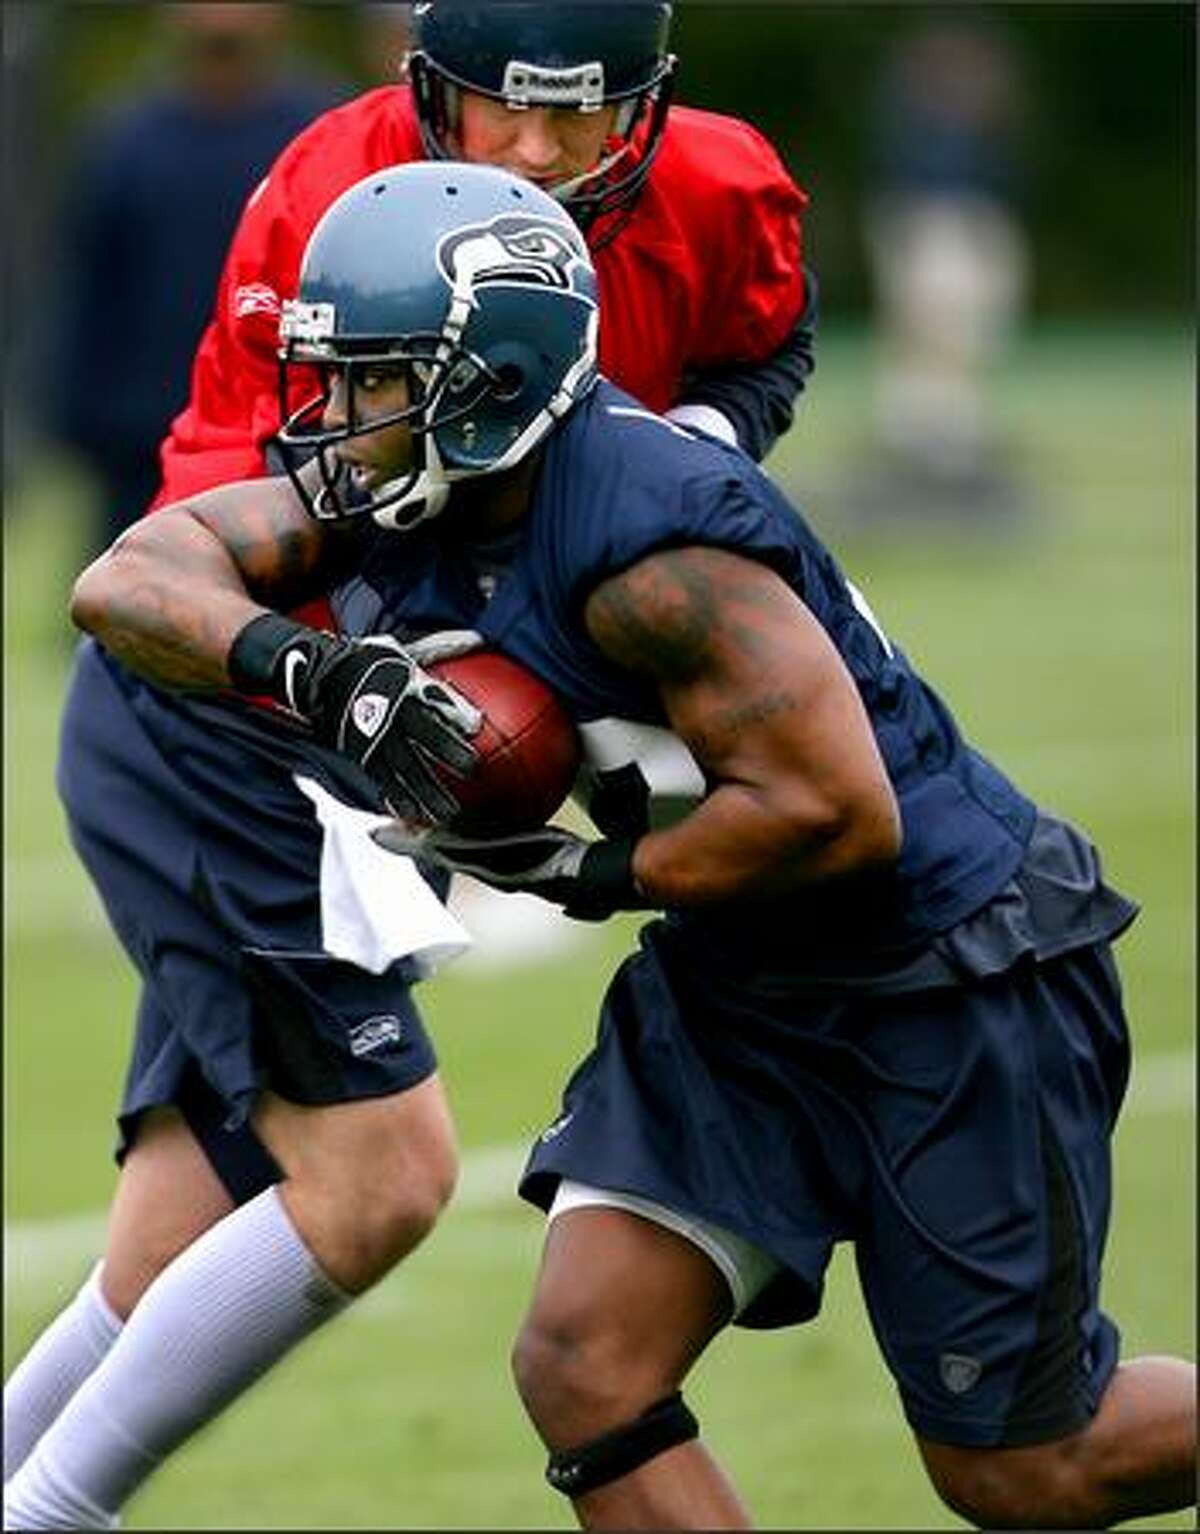 New Seahawks' running back Julius Jones takes a hand off from quarterback Matt Hasselbeck.